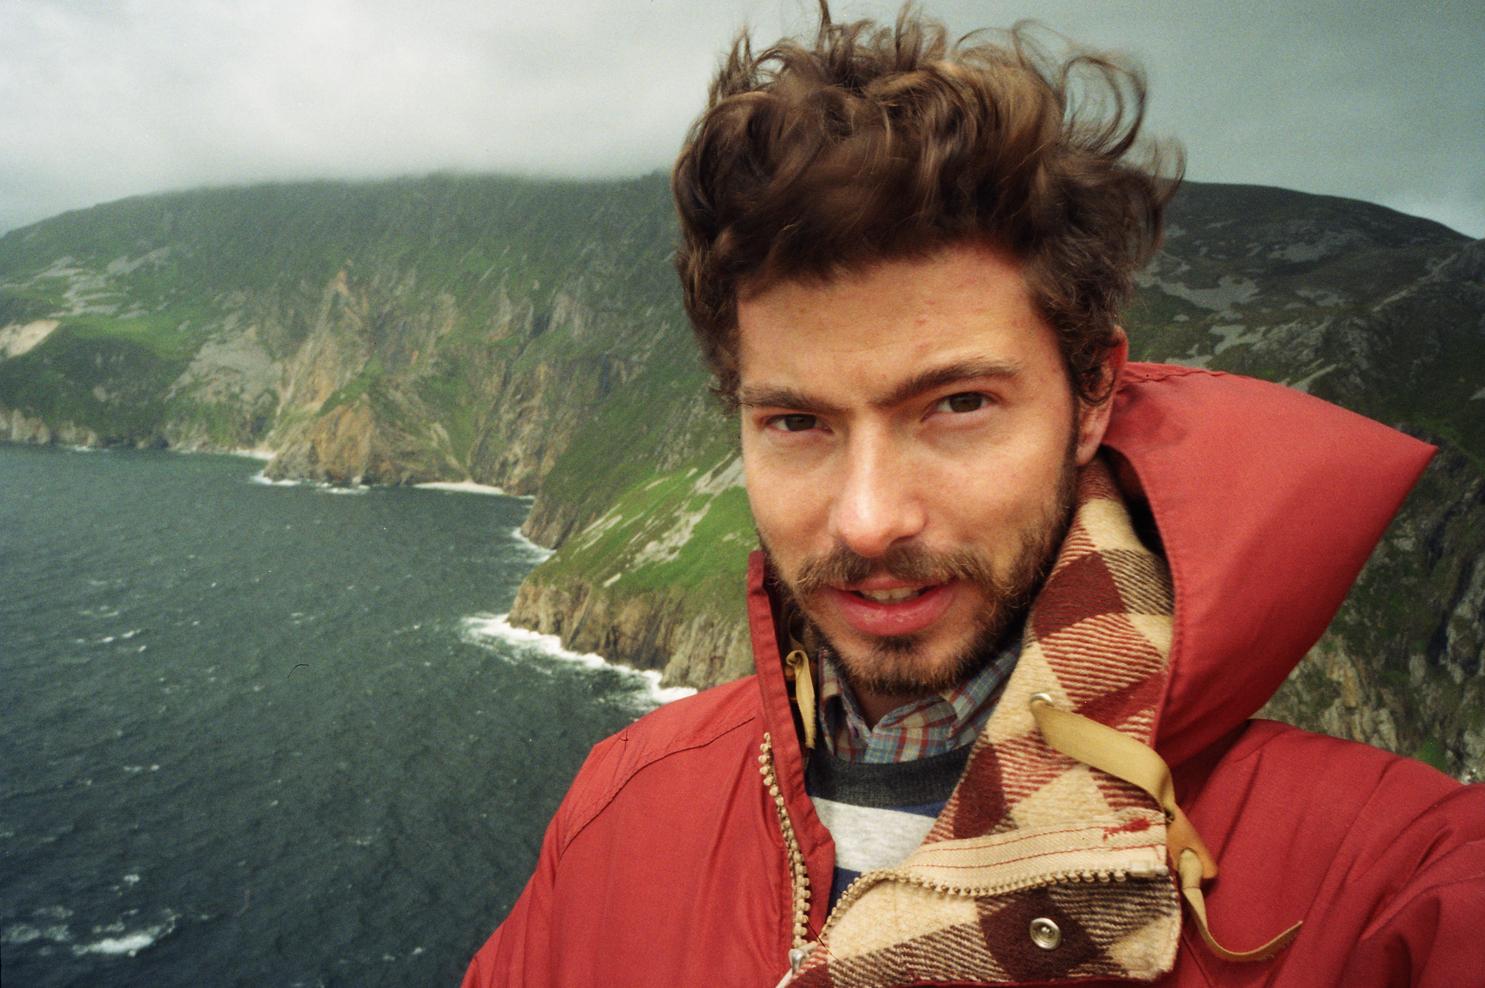 Windblow on the Irish coast - he fits right in.